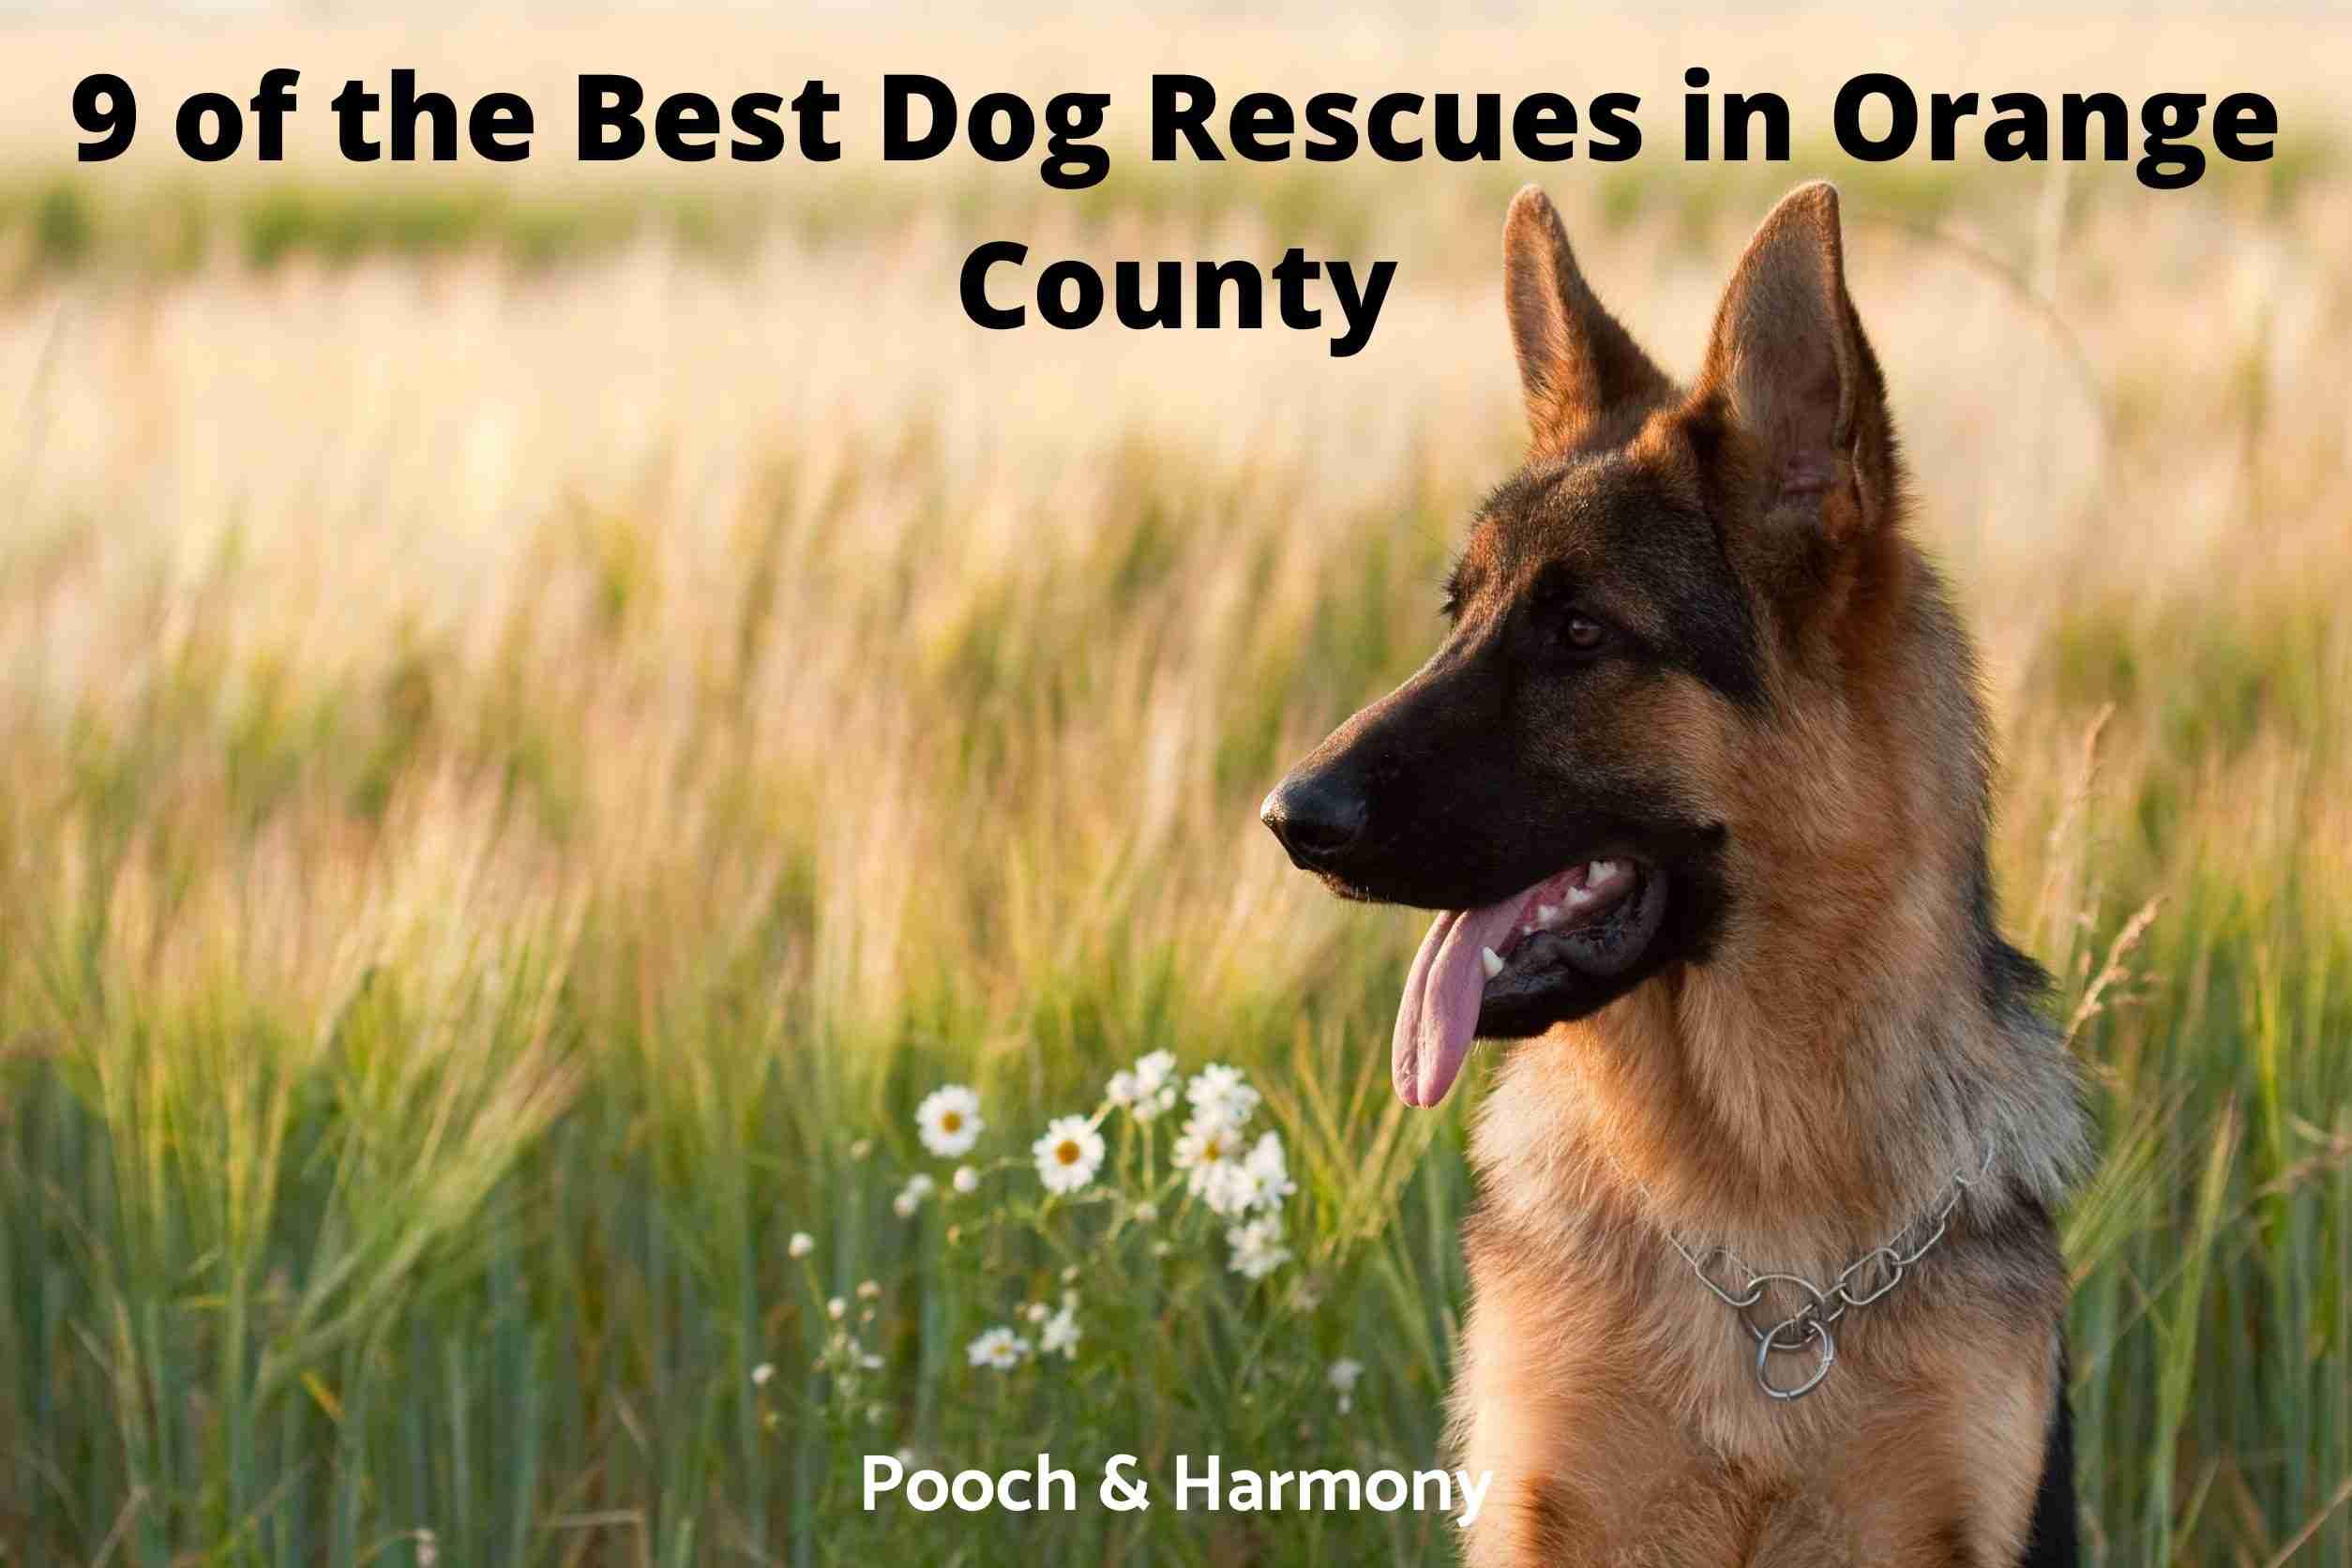 Best Dog Rescues in Orange County